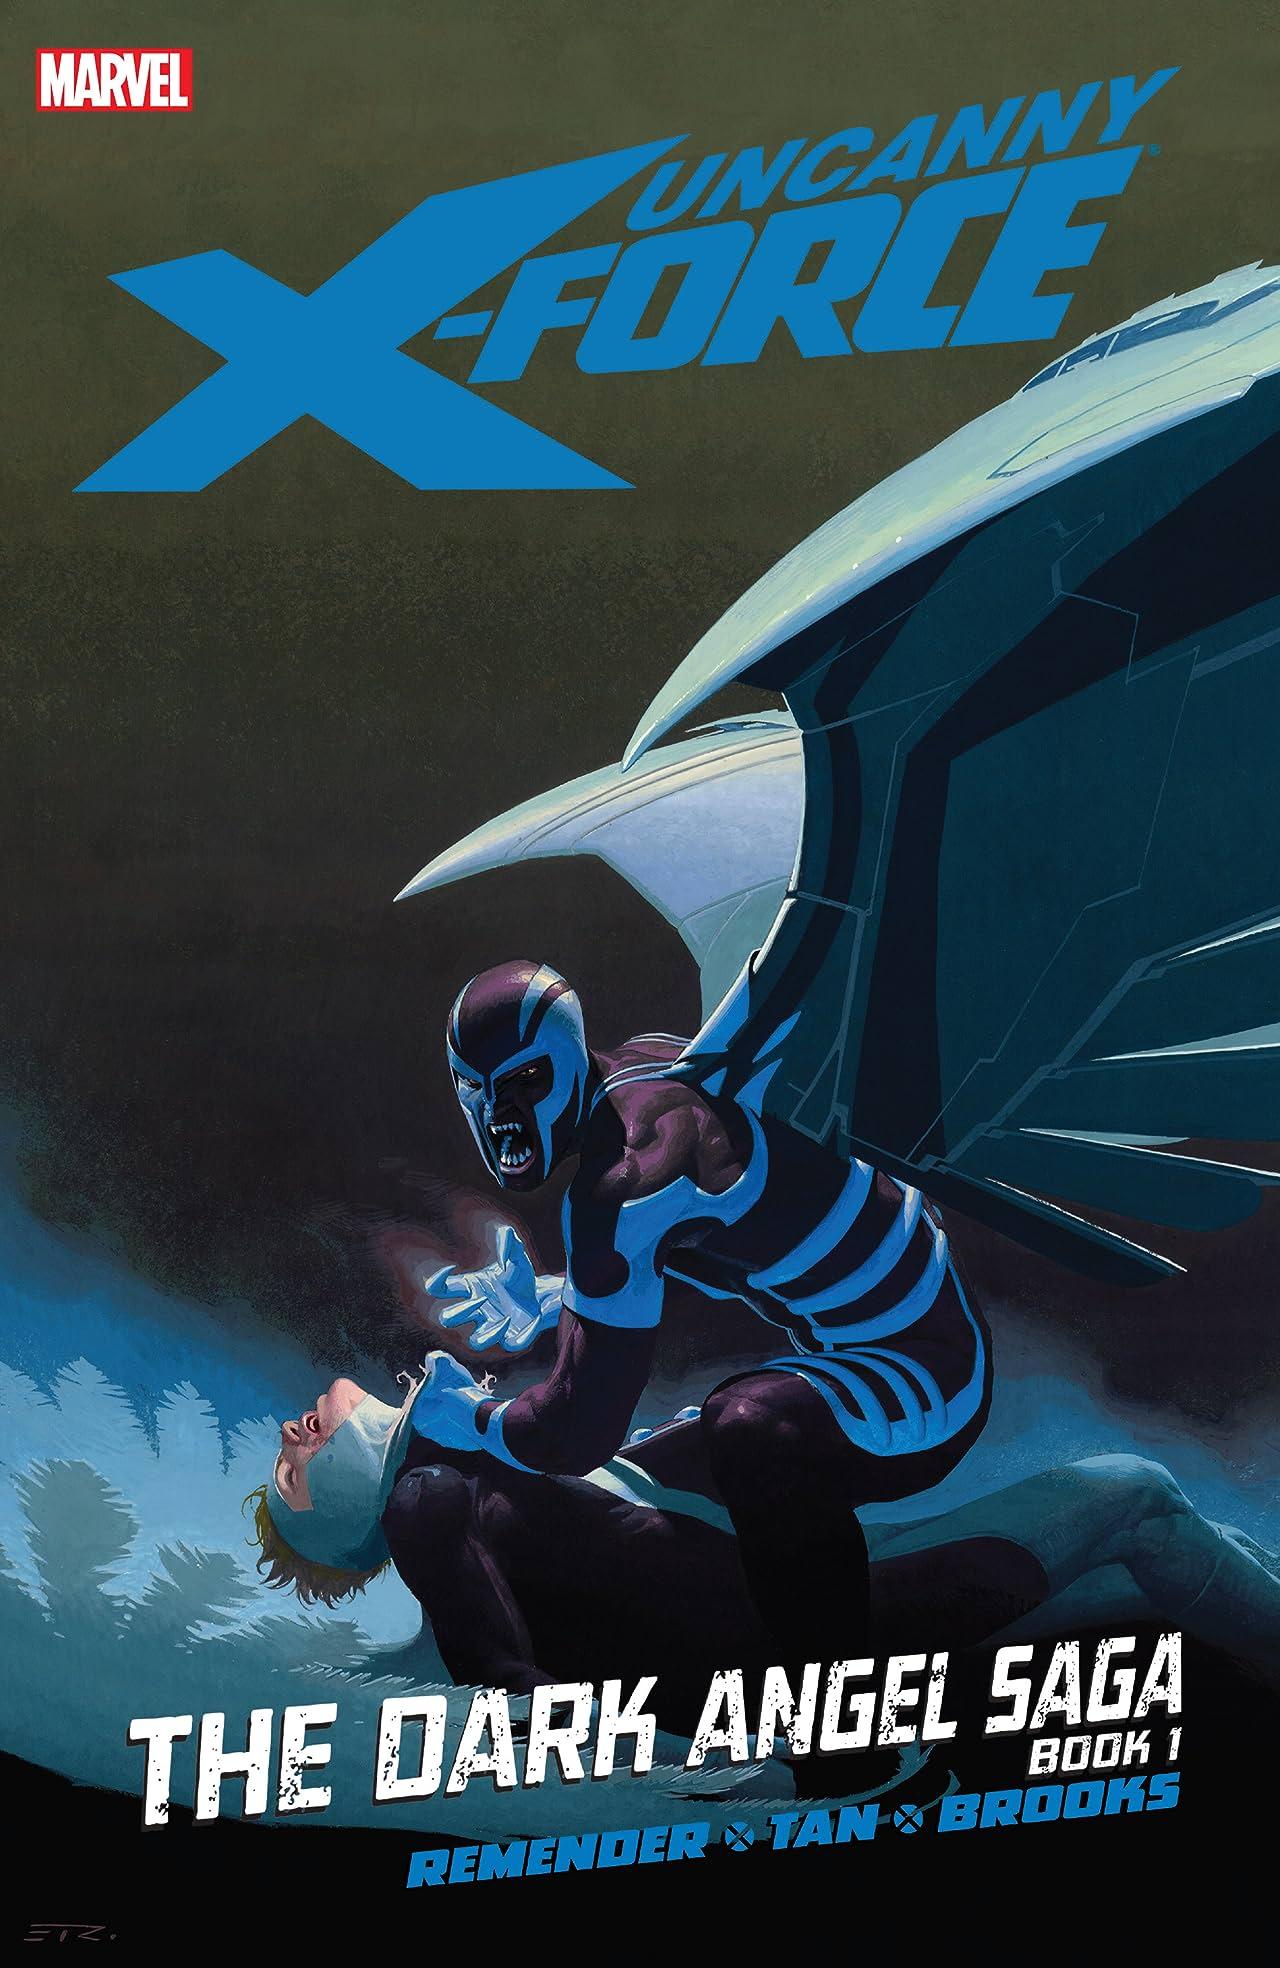 Uncanny X-Force Vol. 3: Dark Angel Saga Book 1